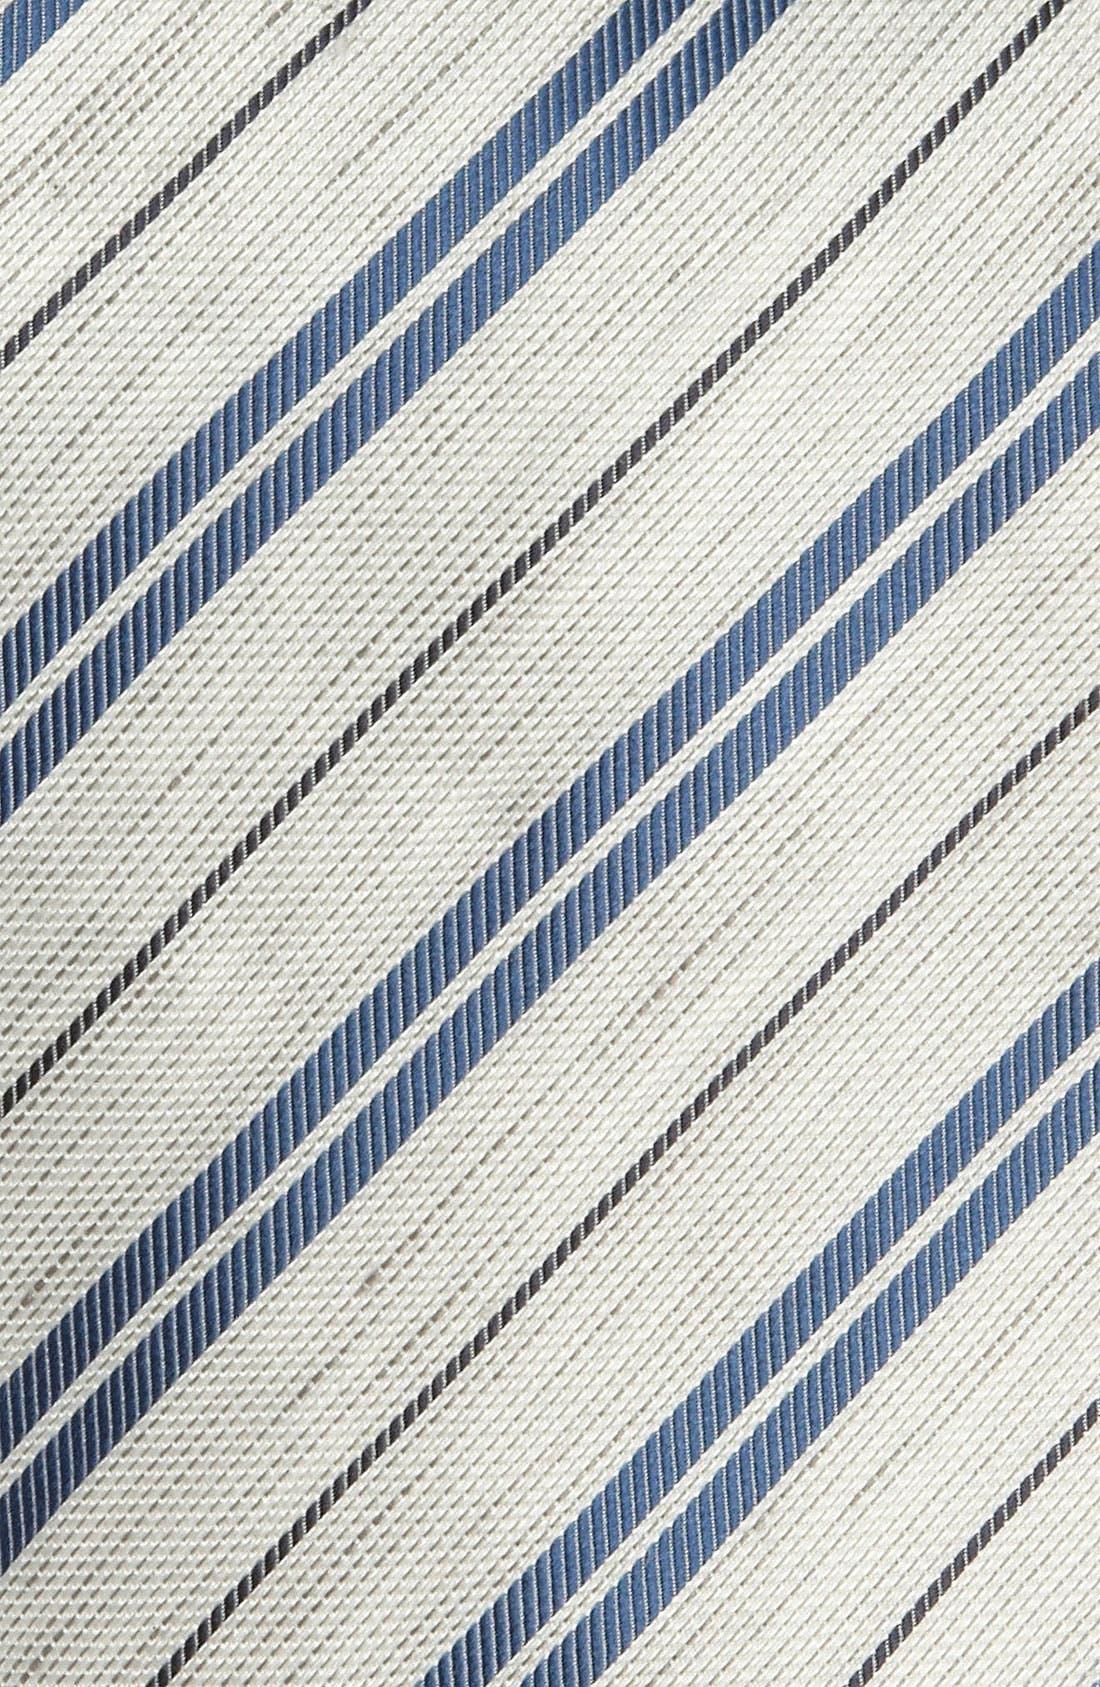 Silk Blend Tie,                             Alternate thumbnail 2, color,                             074